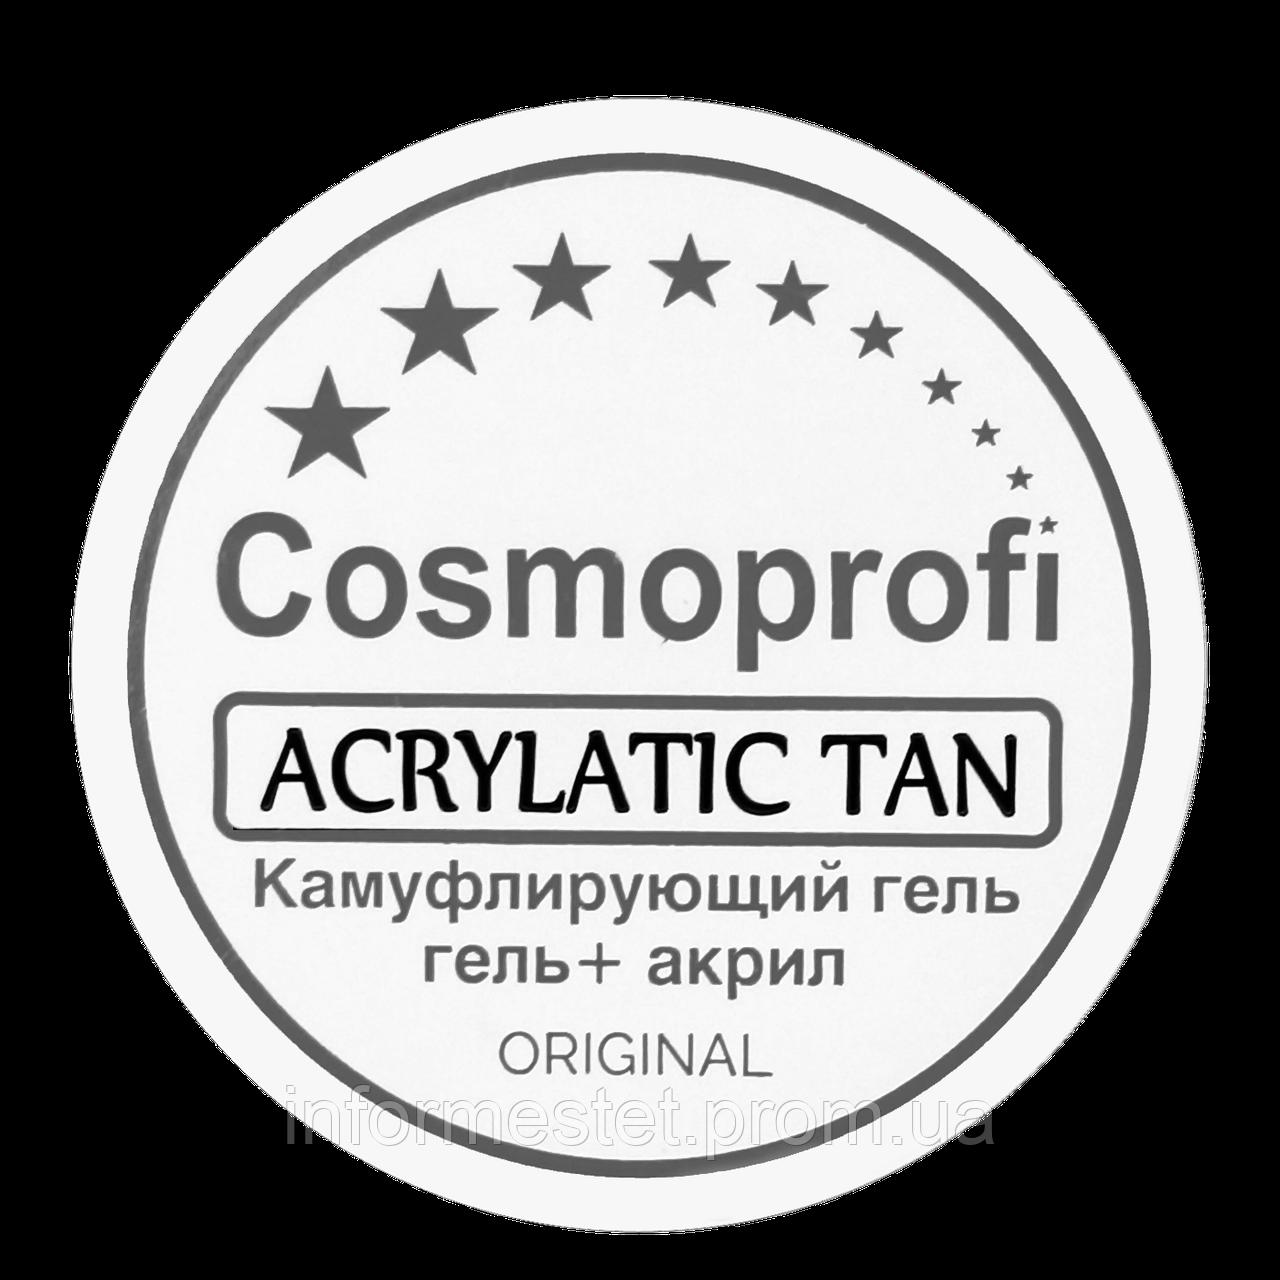 Acrylatic  Tan 50g